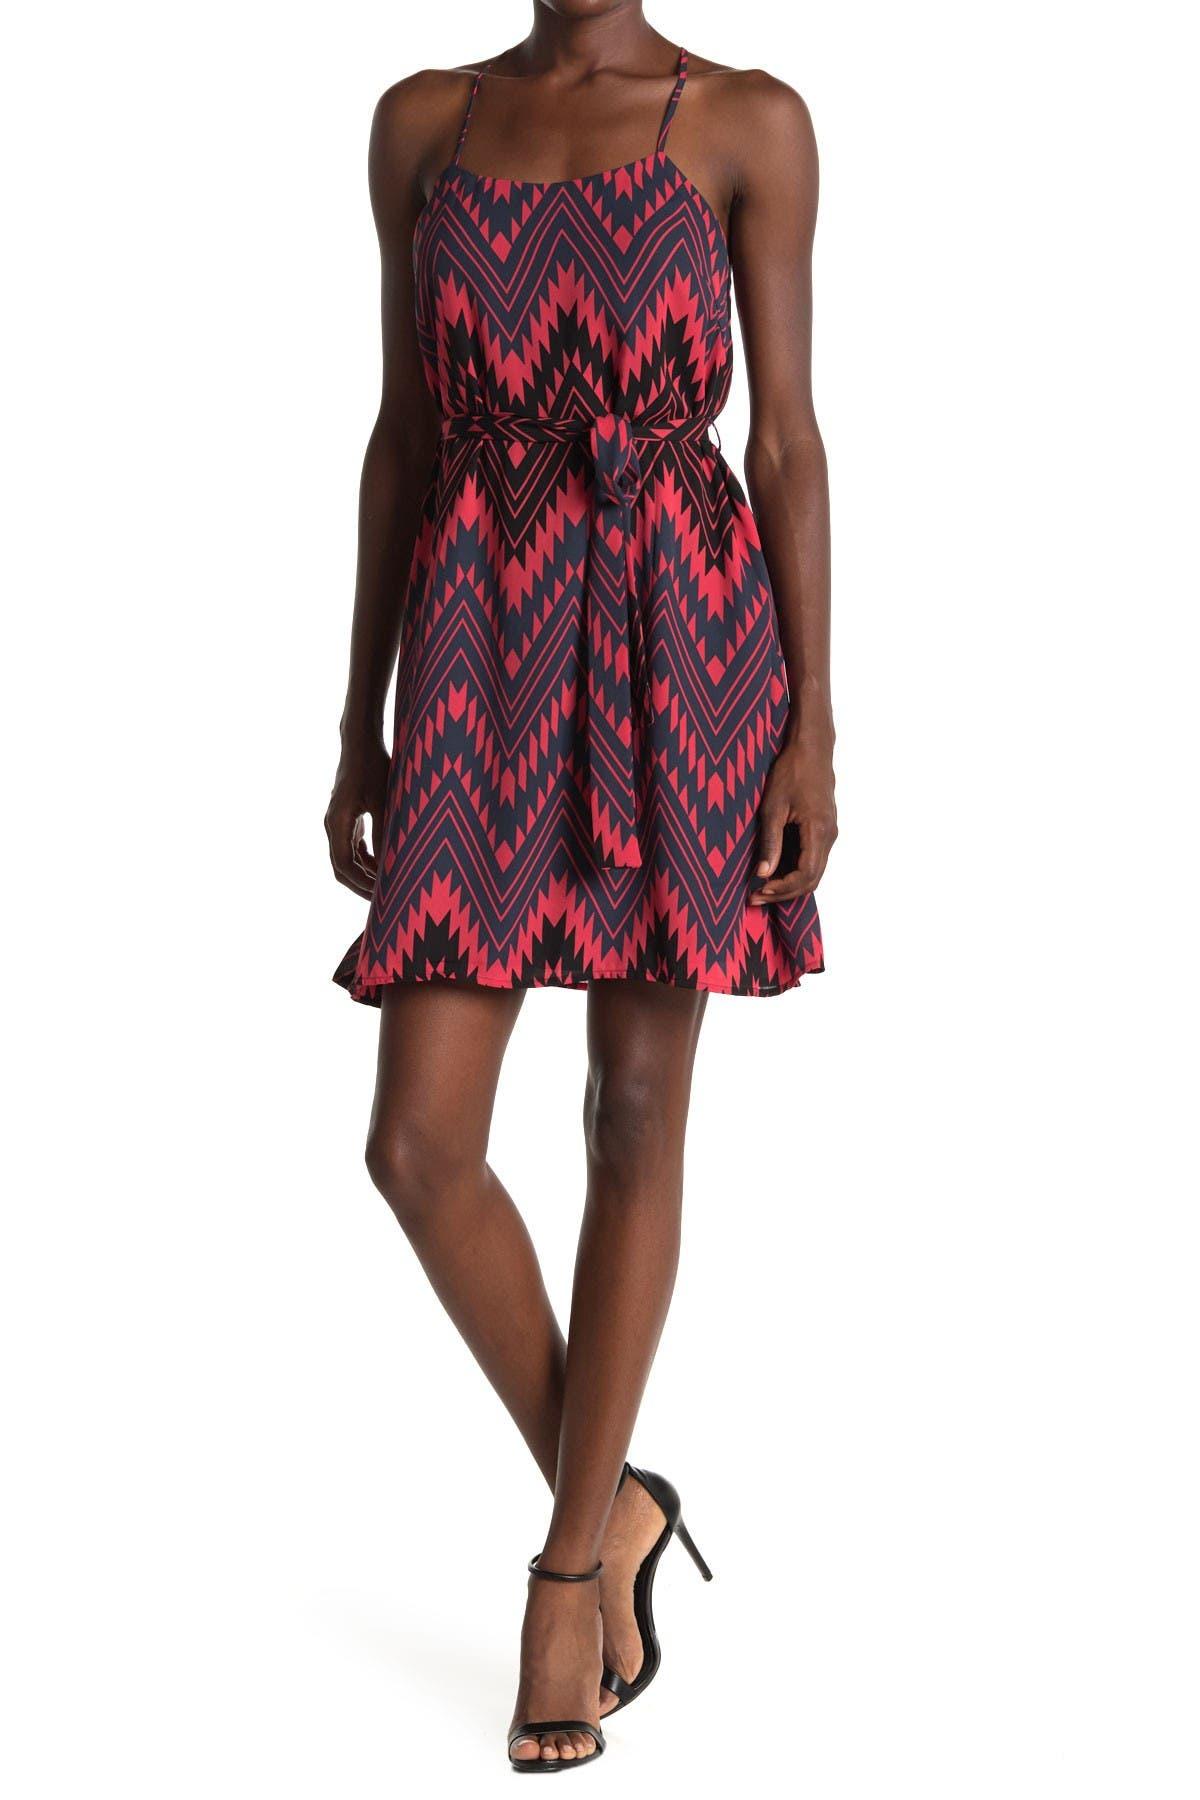 Image of Collective Concepts Chevron Print Sleeveless Shift Dress